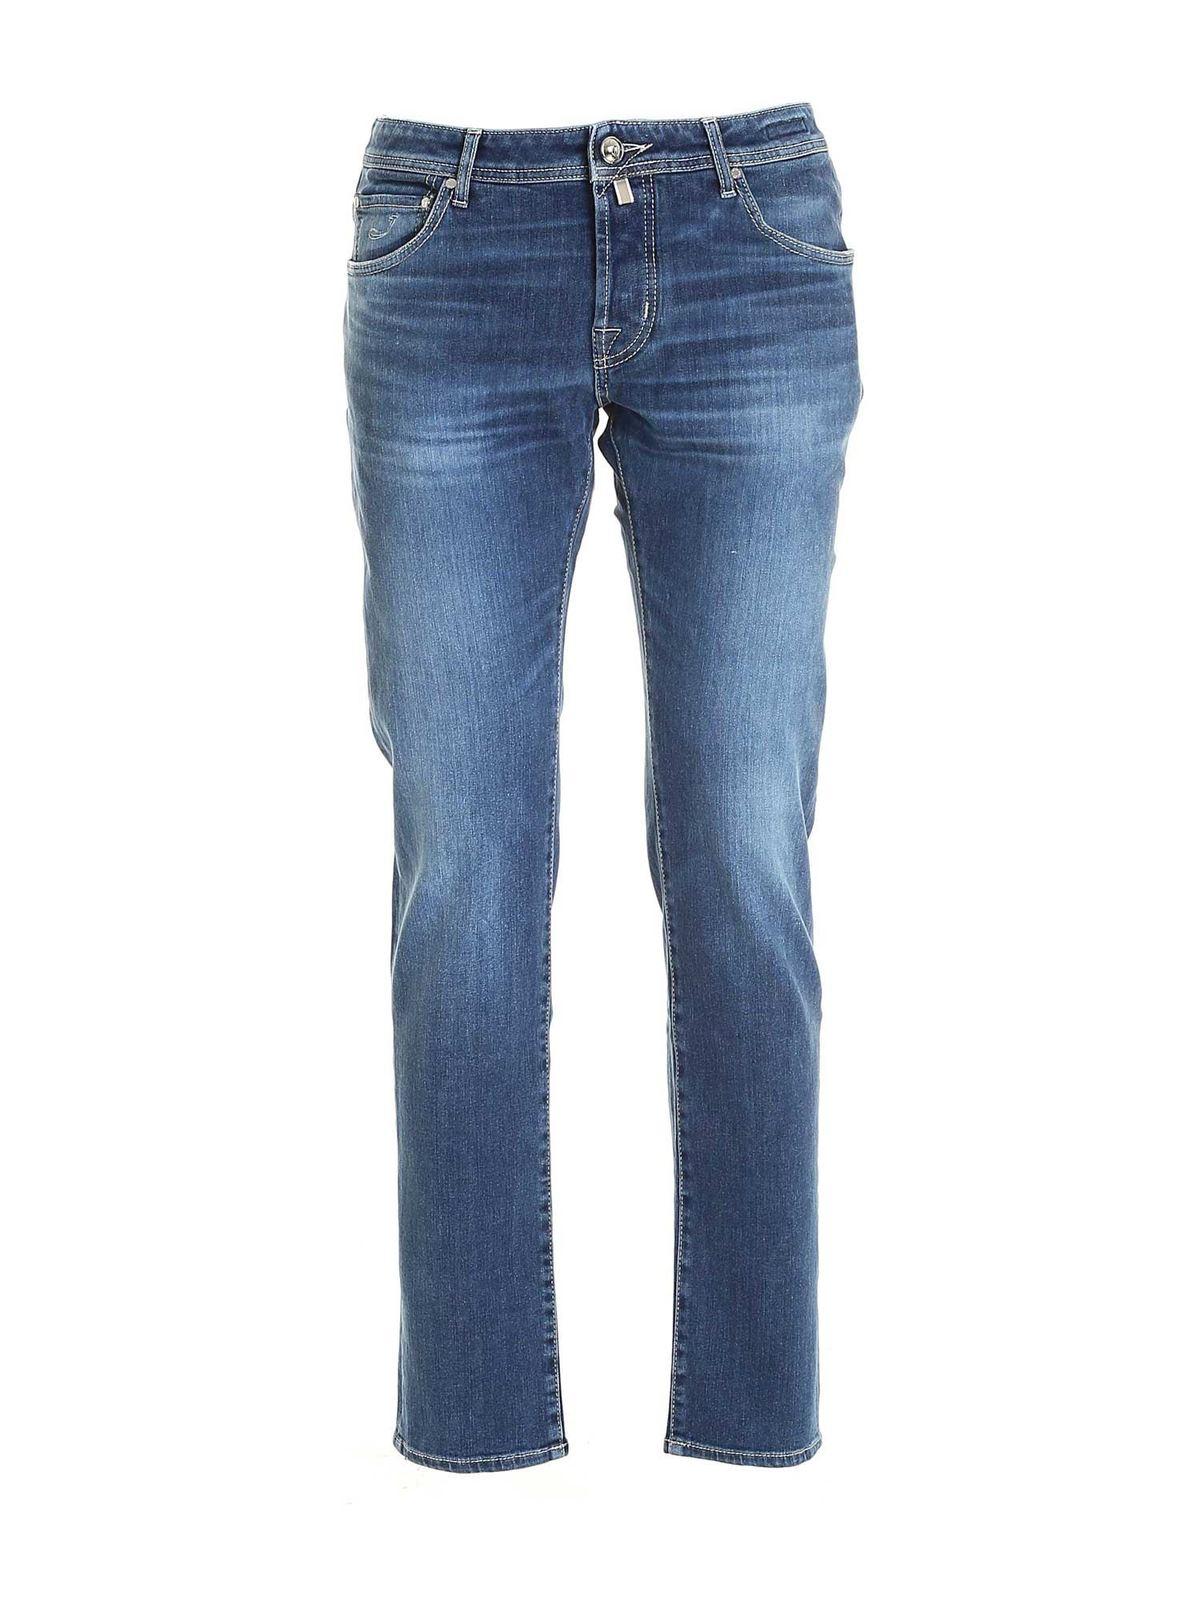 Jacob Cohen Beige Calf Hair Logo Jeans In Blue